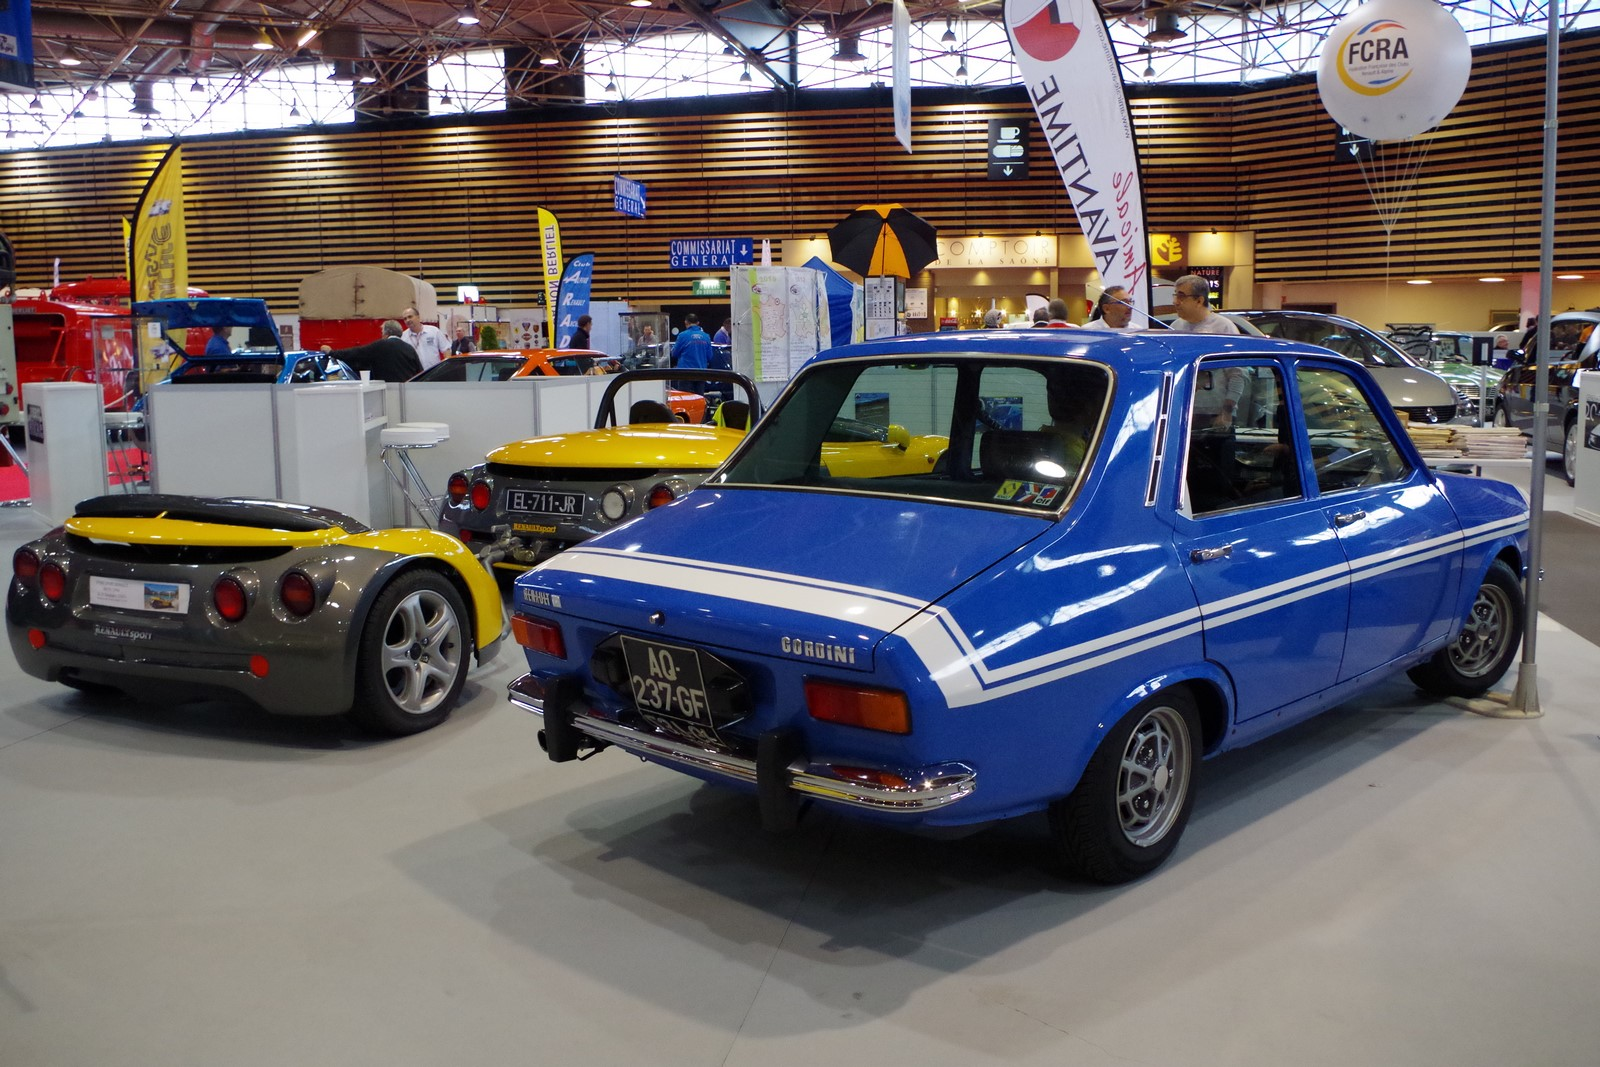 EpoquAuto 2018 FCRA Renault 31